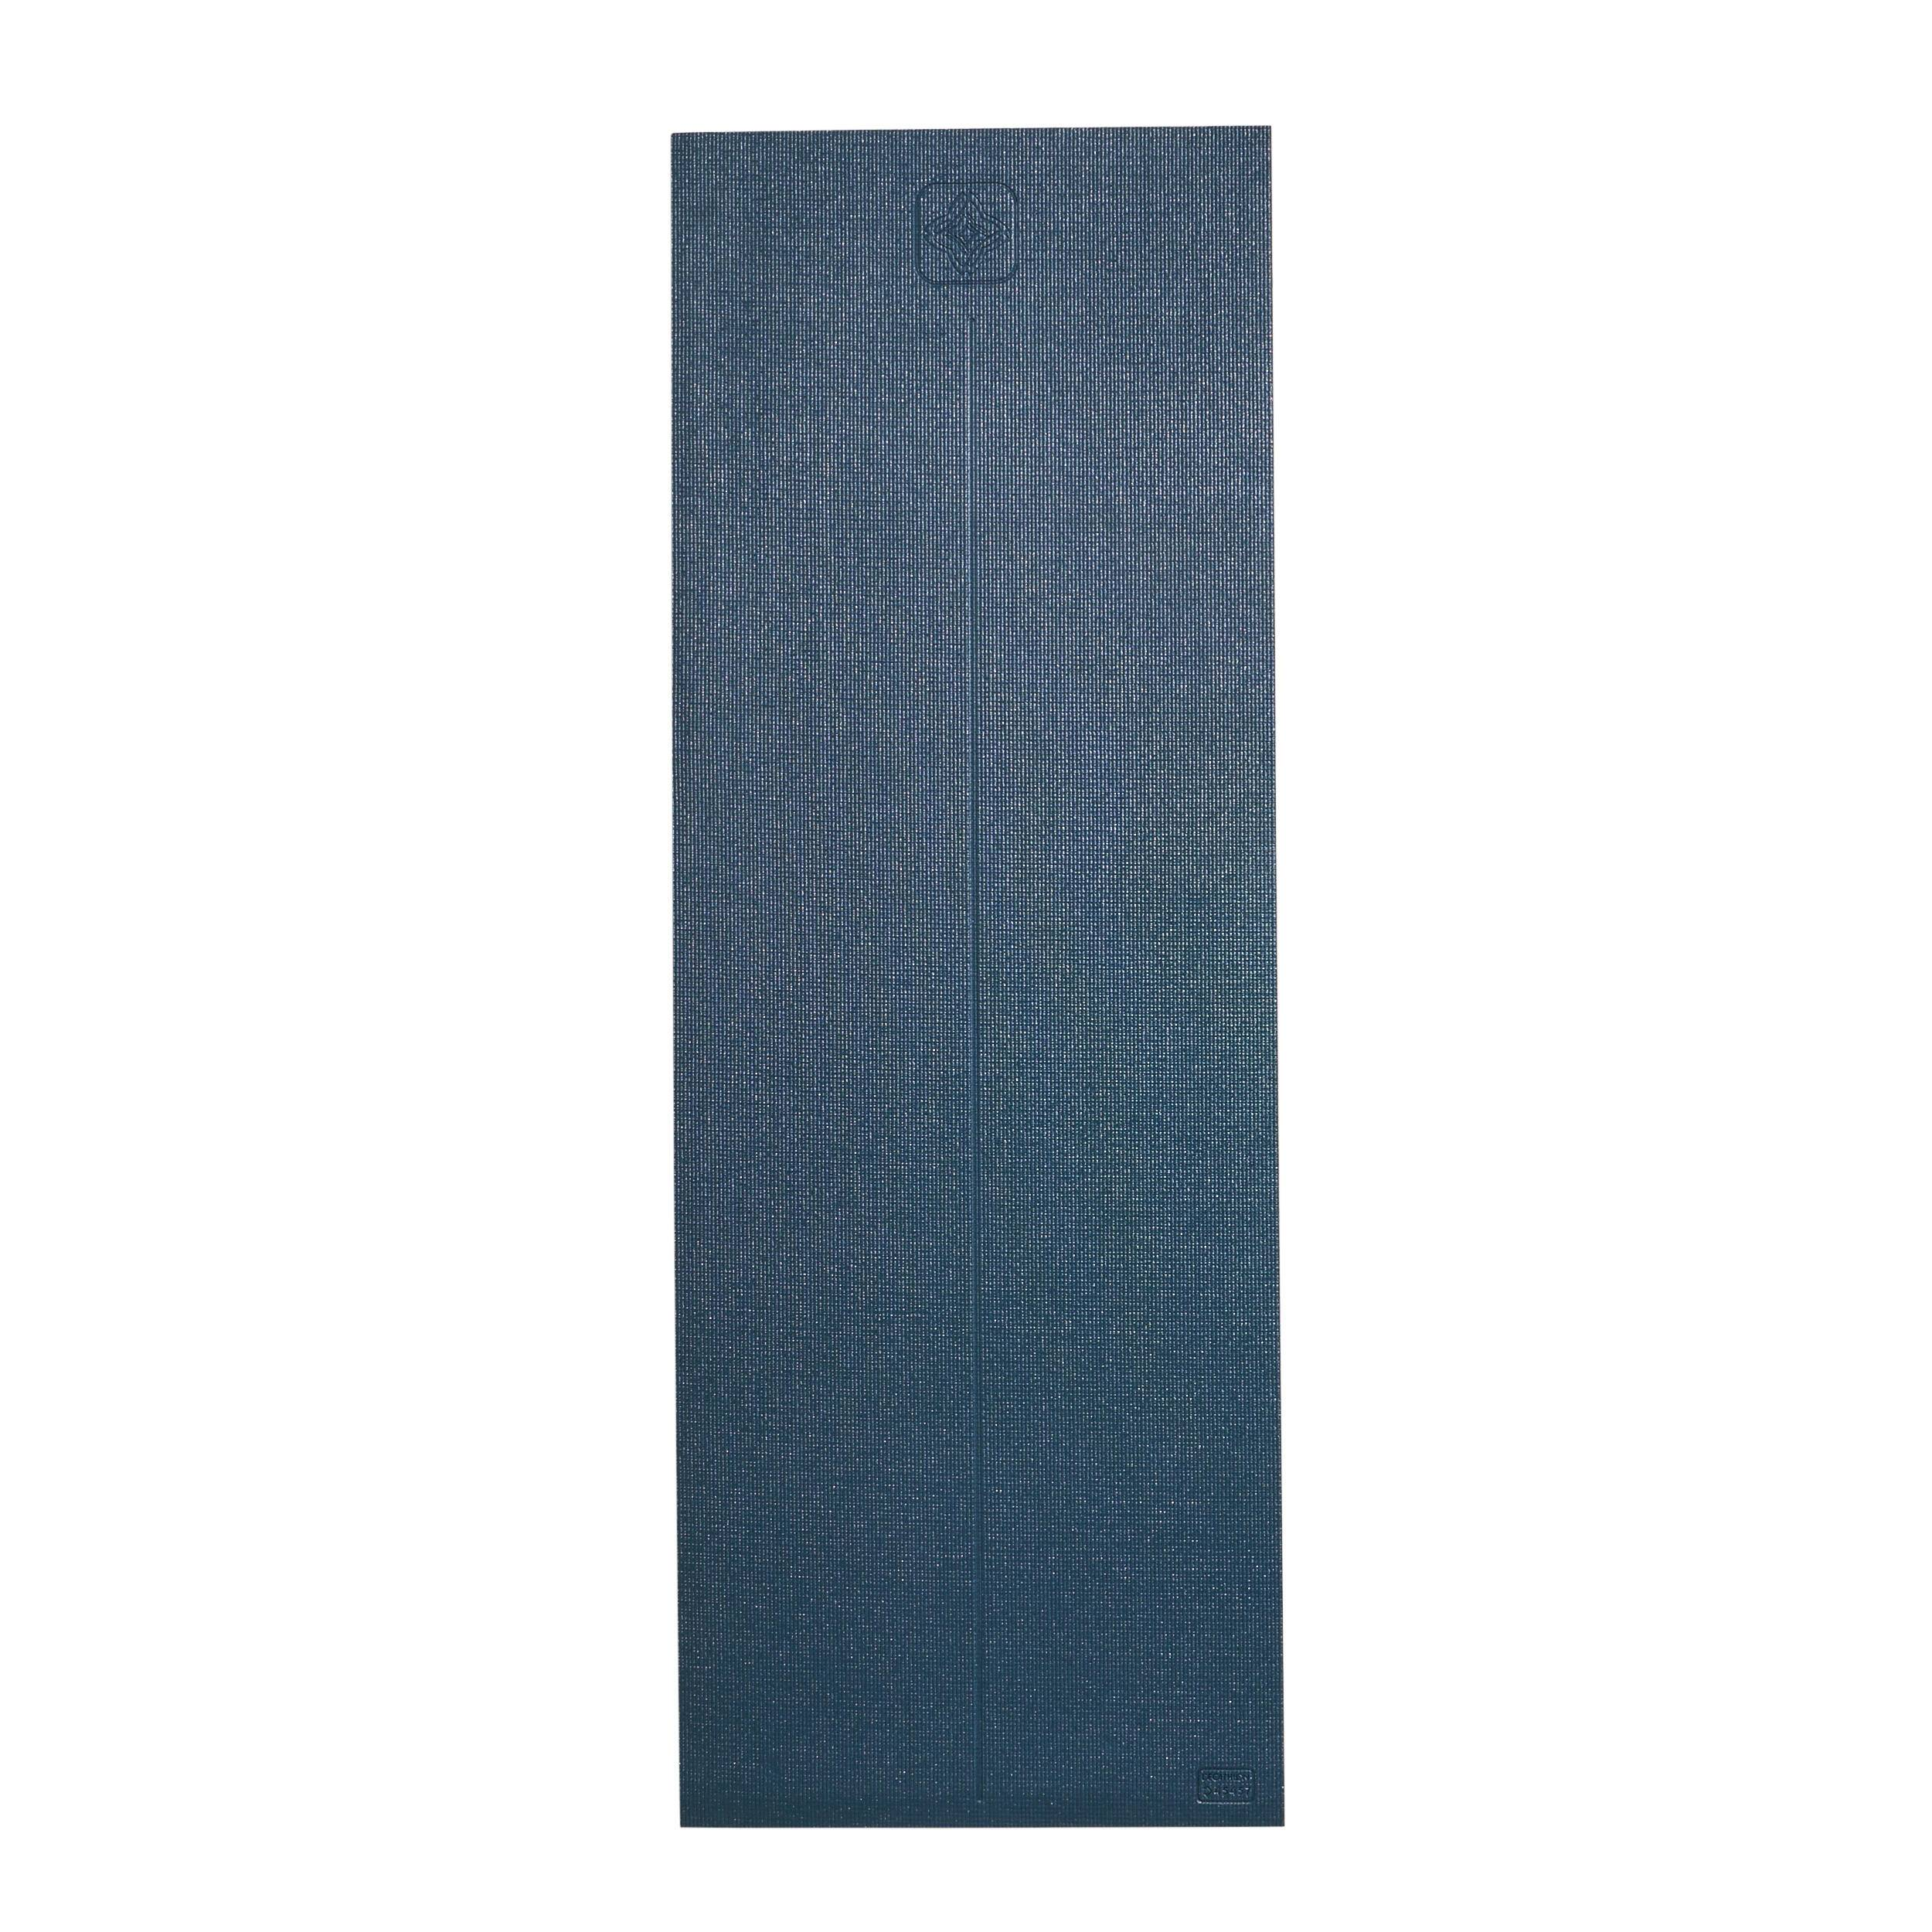 kimjaly tappetino yoga comfort 8 mm turchese 173x61cm